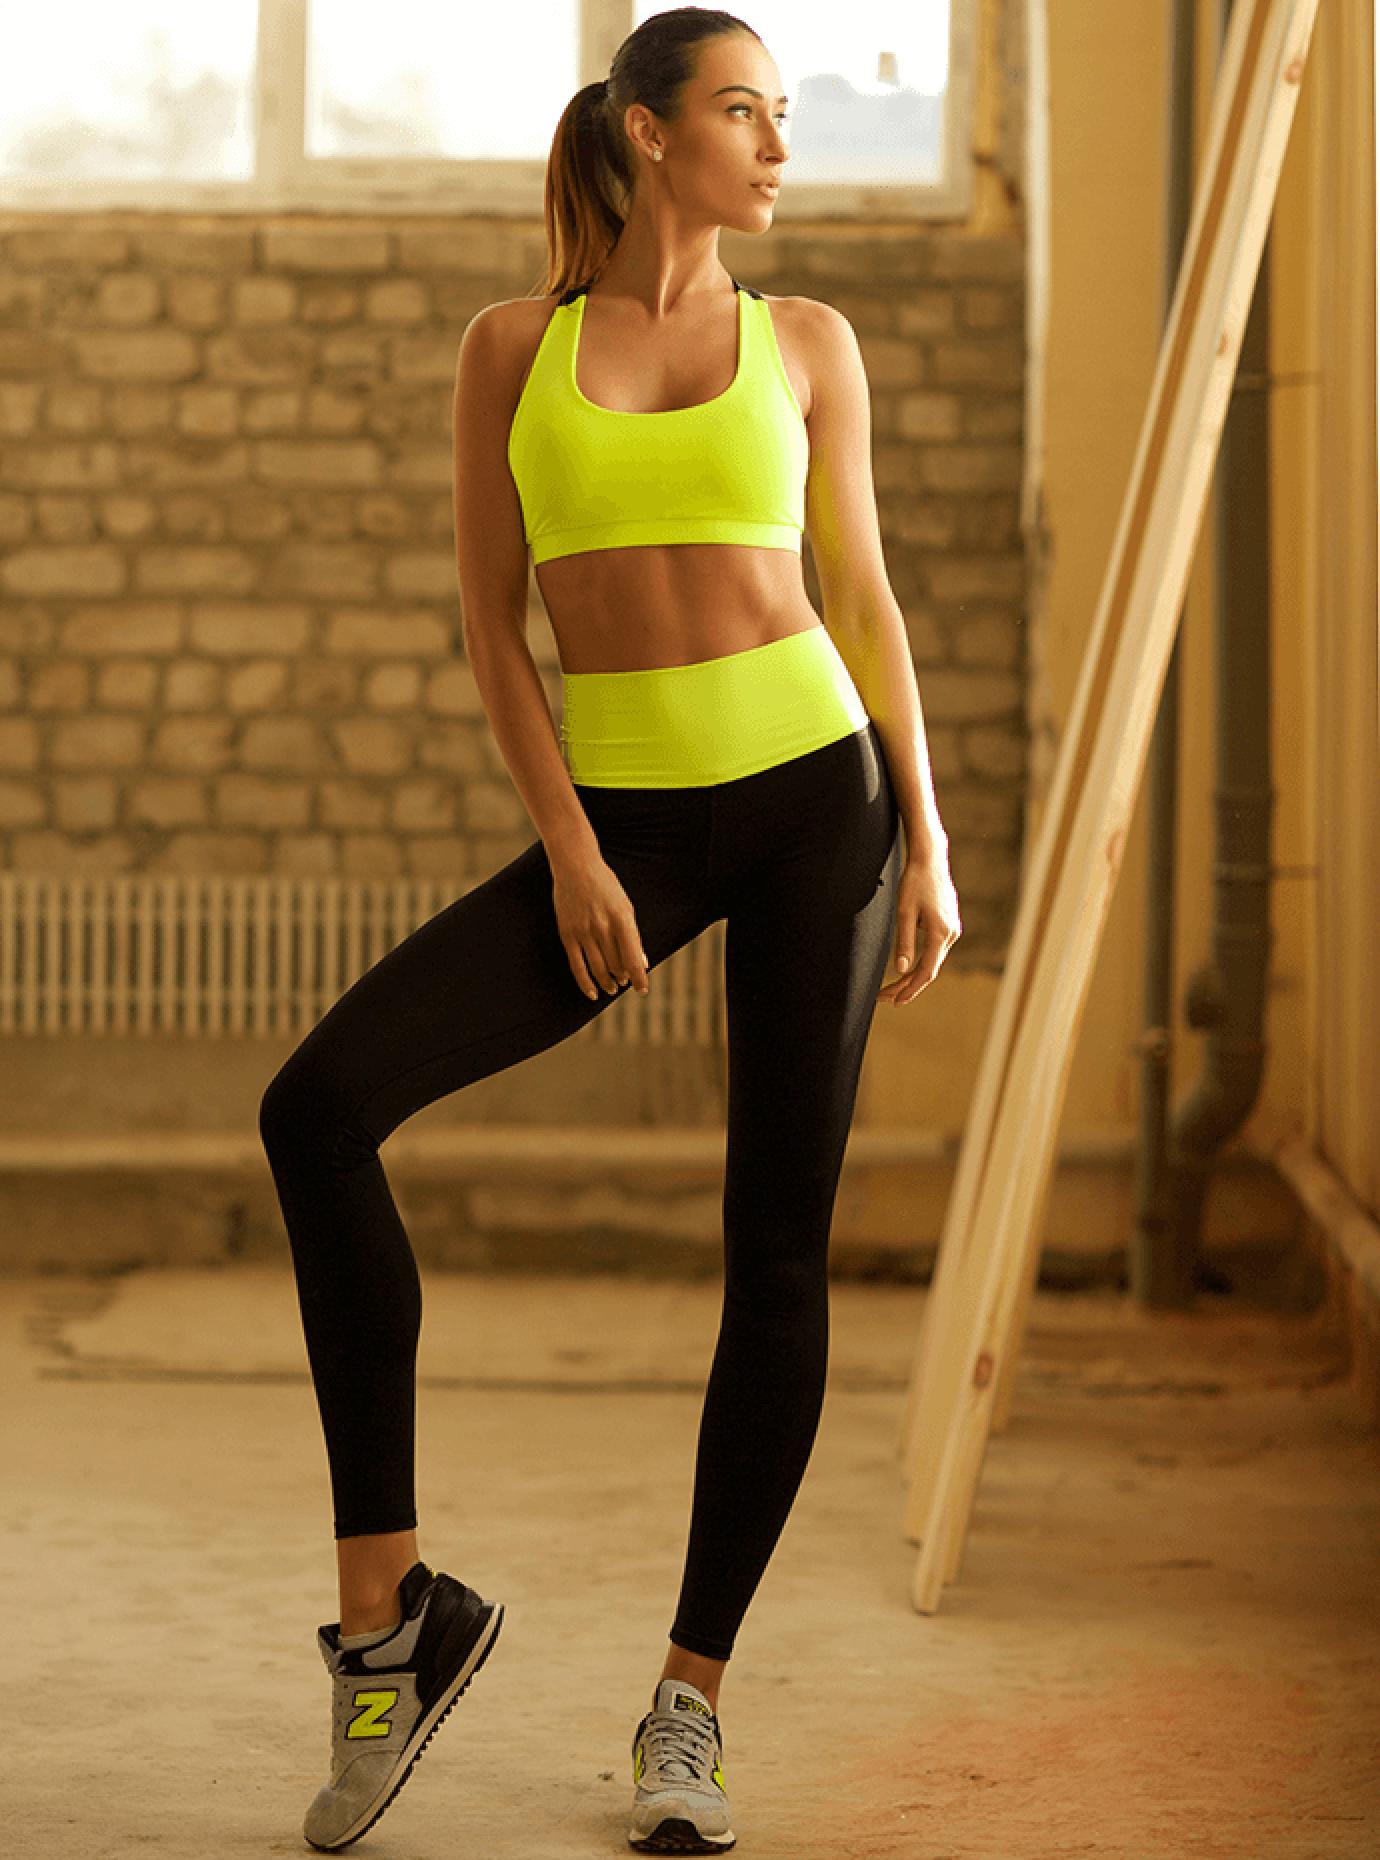 Комплект женский High Waist Lemon Leggings Серый S (01-F171127): фото - Alster.ua